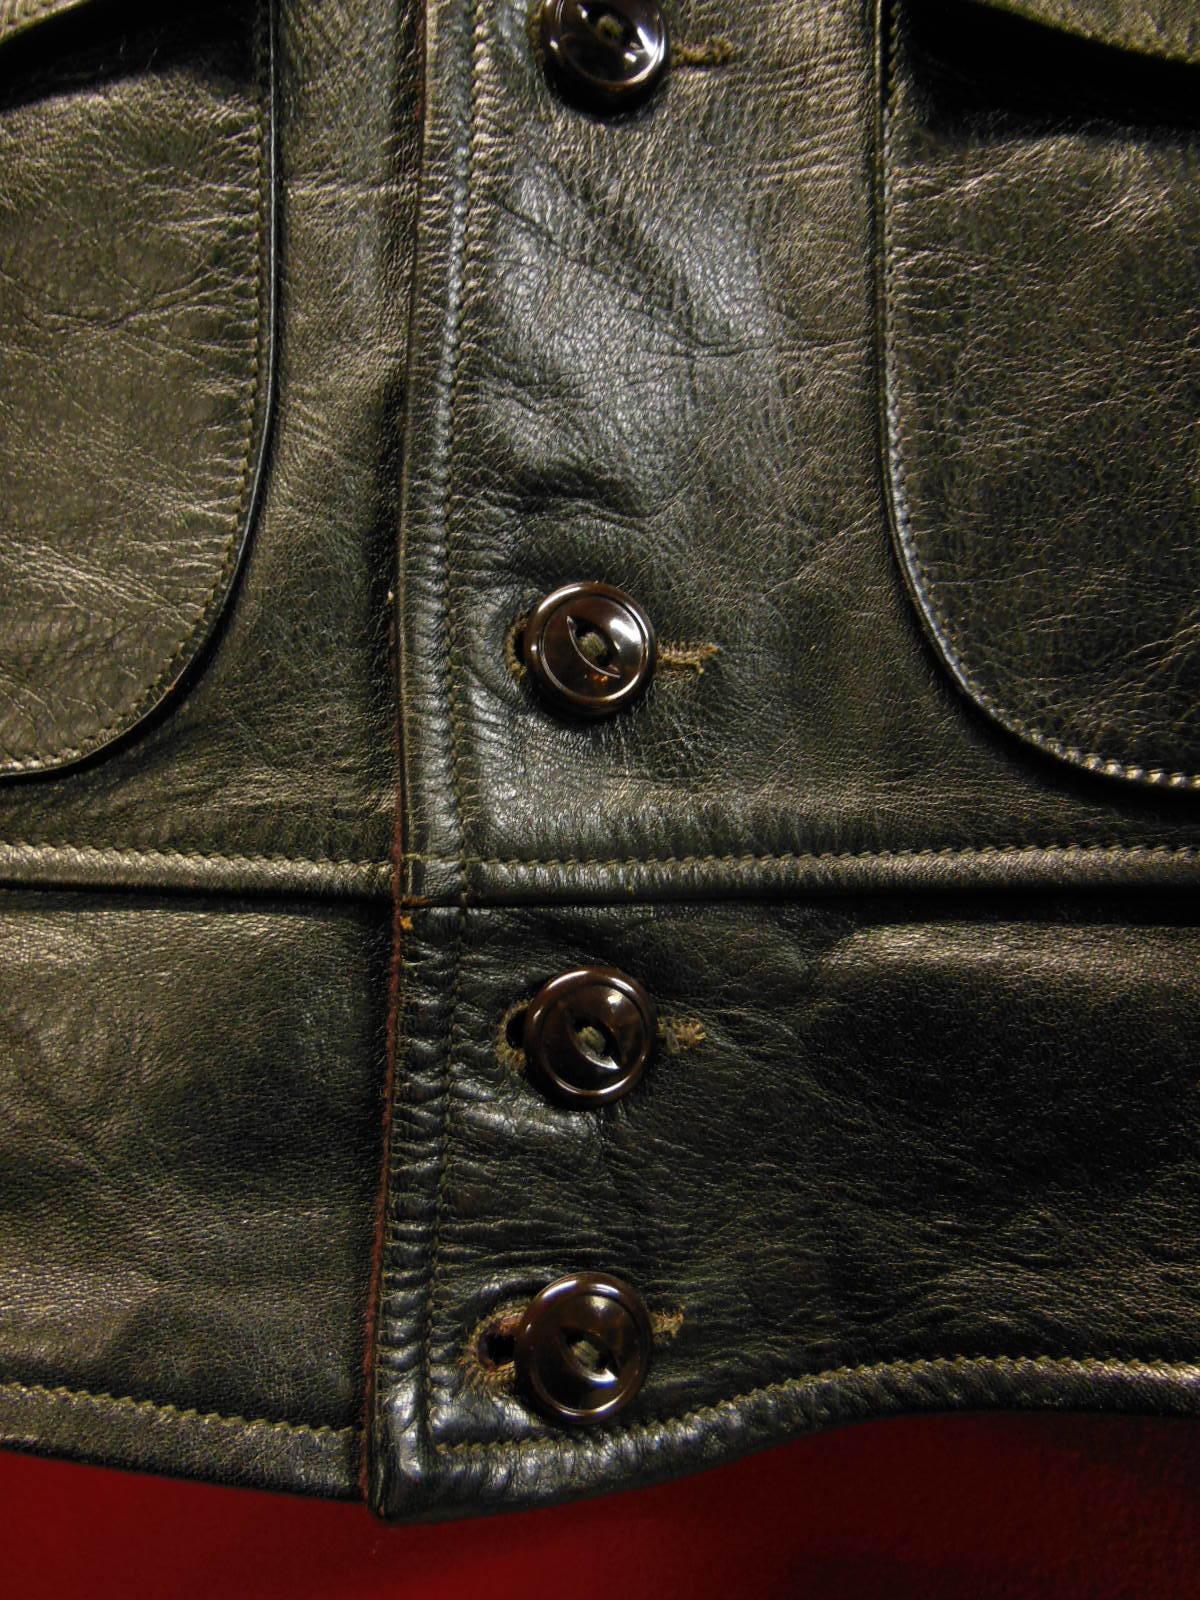 USED HIMEL BROTHERS LEATHER HERON 1929/新喜皮革製黒ホースハイド/SIZE-36/ボタンフロント A-1 ジャケット_c0187684_15032399.jpg